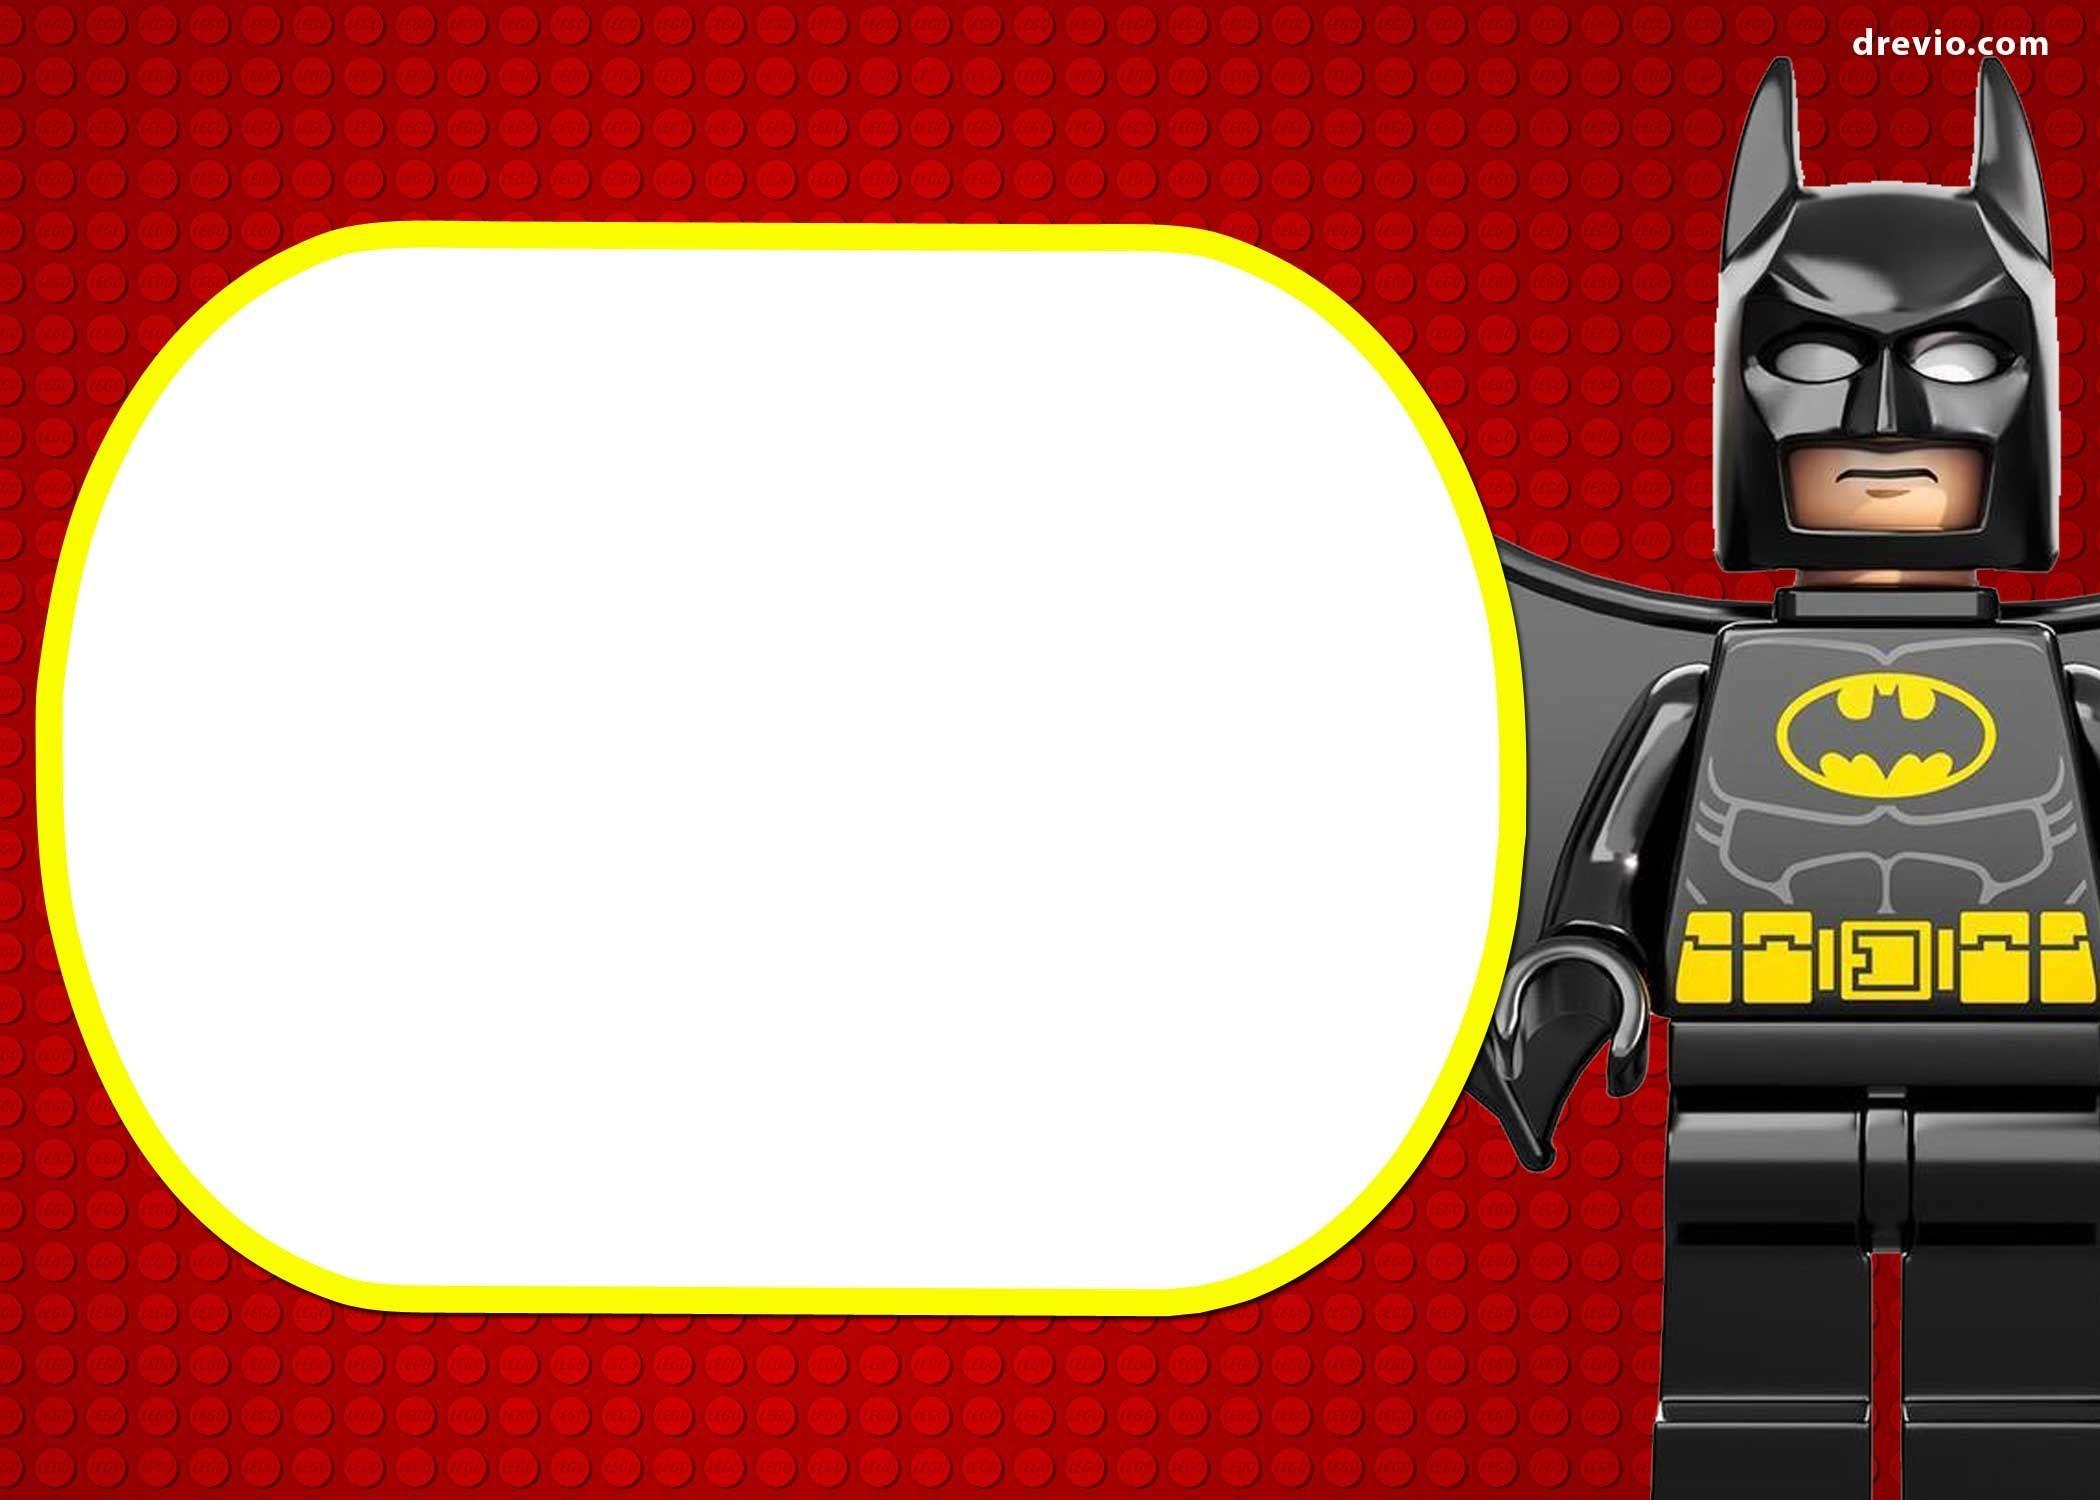 Free Printable Marvel's Lego Invitation   Free Printable Birthday - Lego Batman Invitations Free Printable